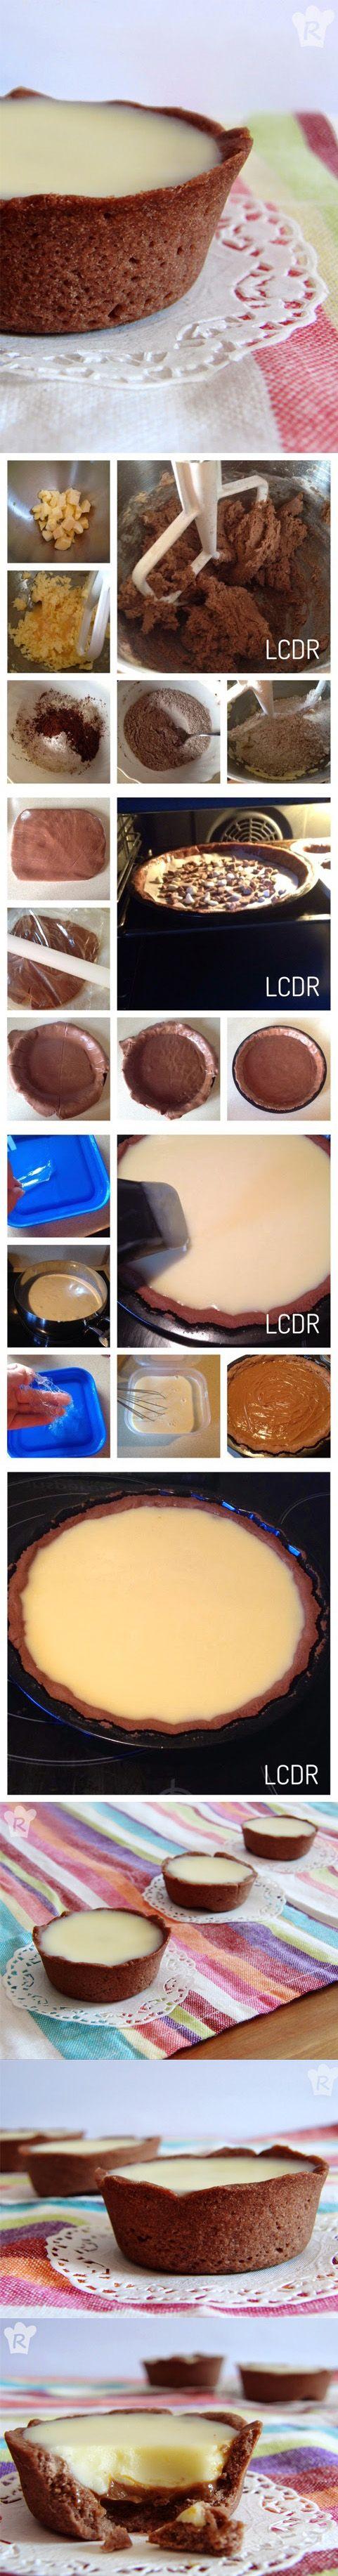 Tartaletas de chocolate y caramelo - Pecados de Reposteria